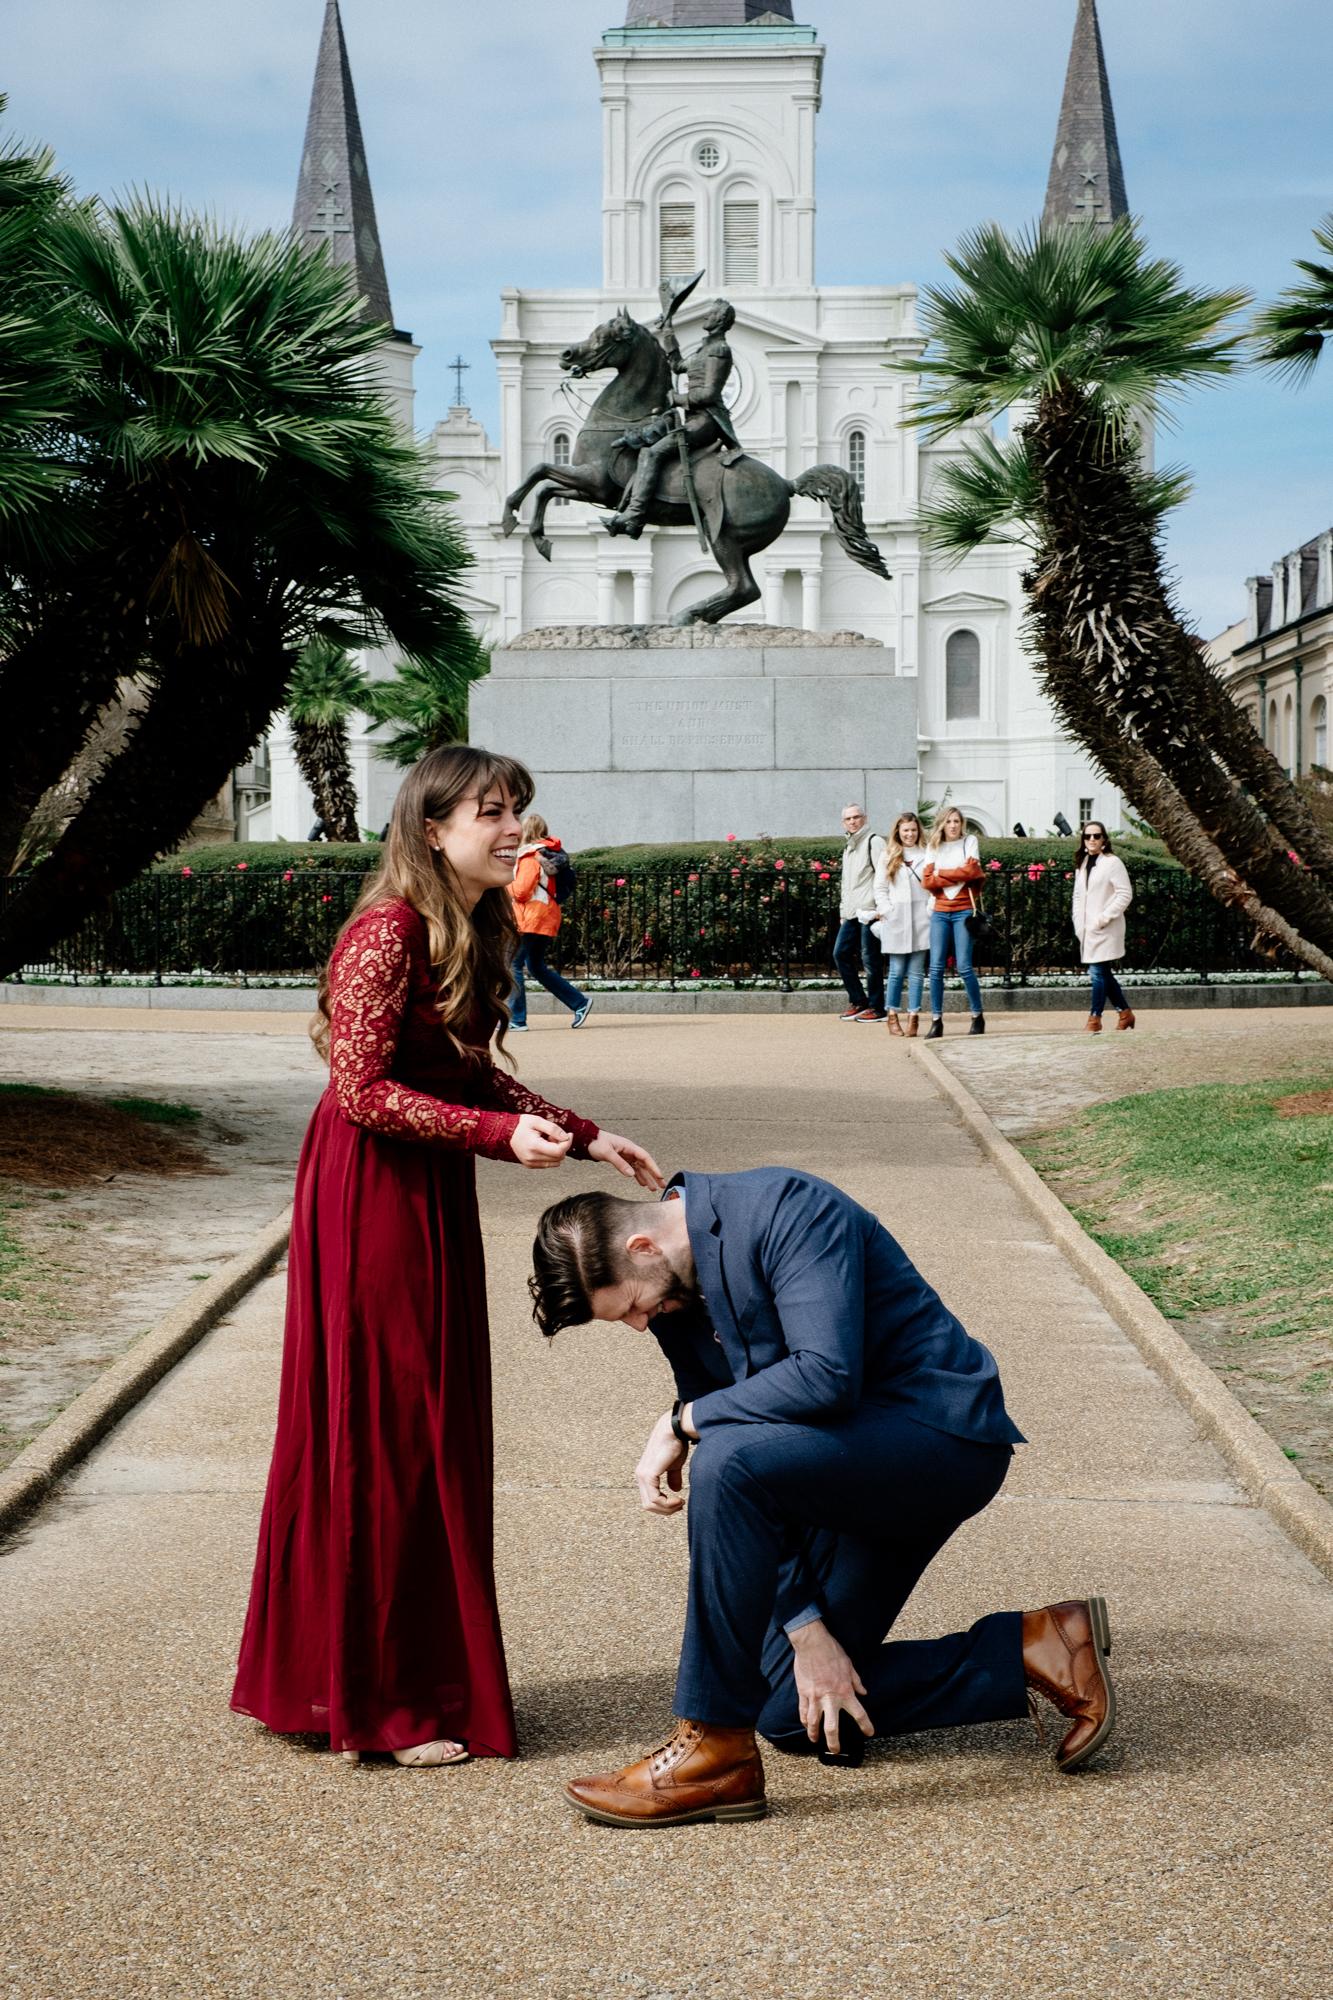 Jen_Montgomery_Photography_Angela_Brian_Engagement_Proposal_FB-17.jpg